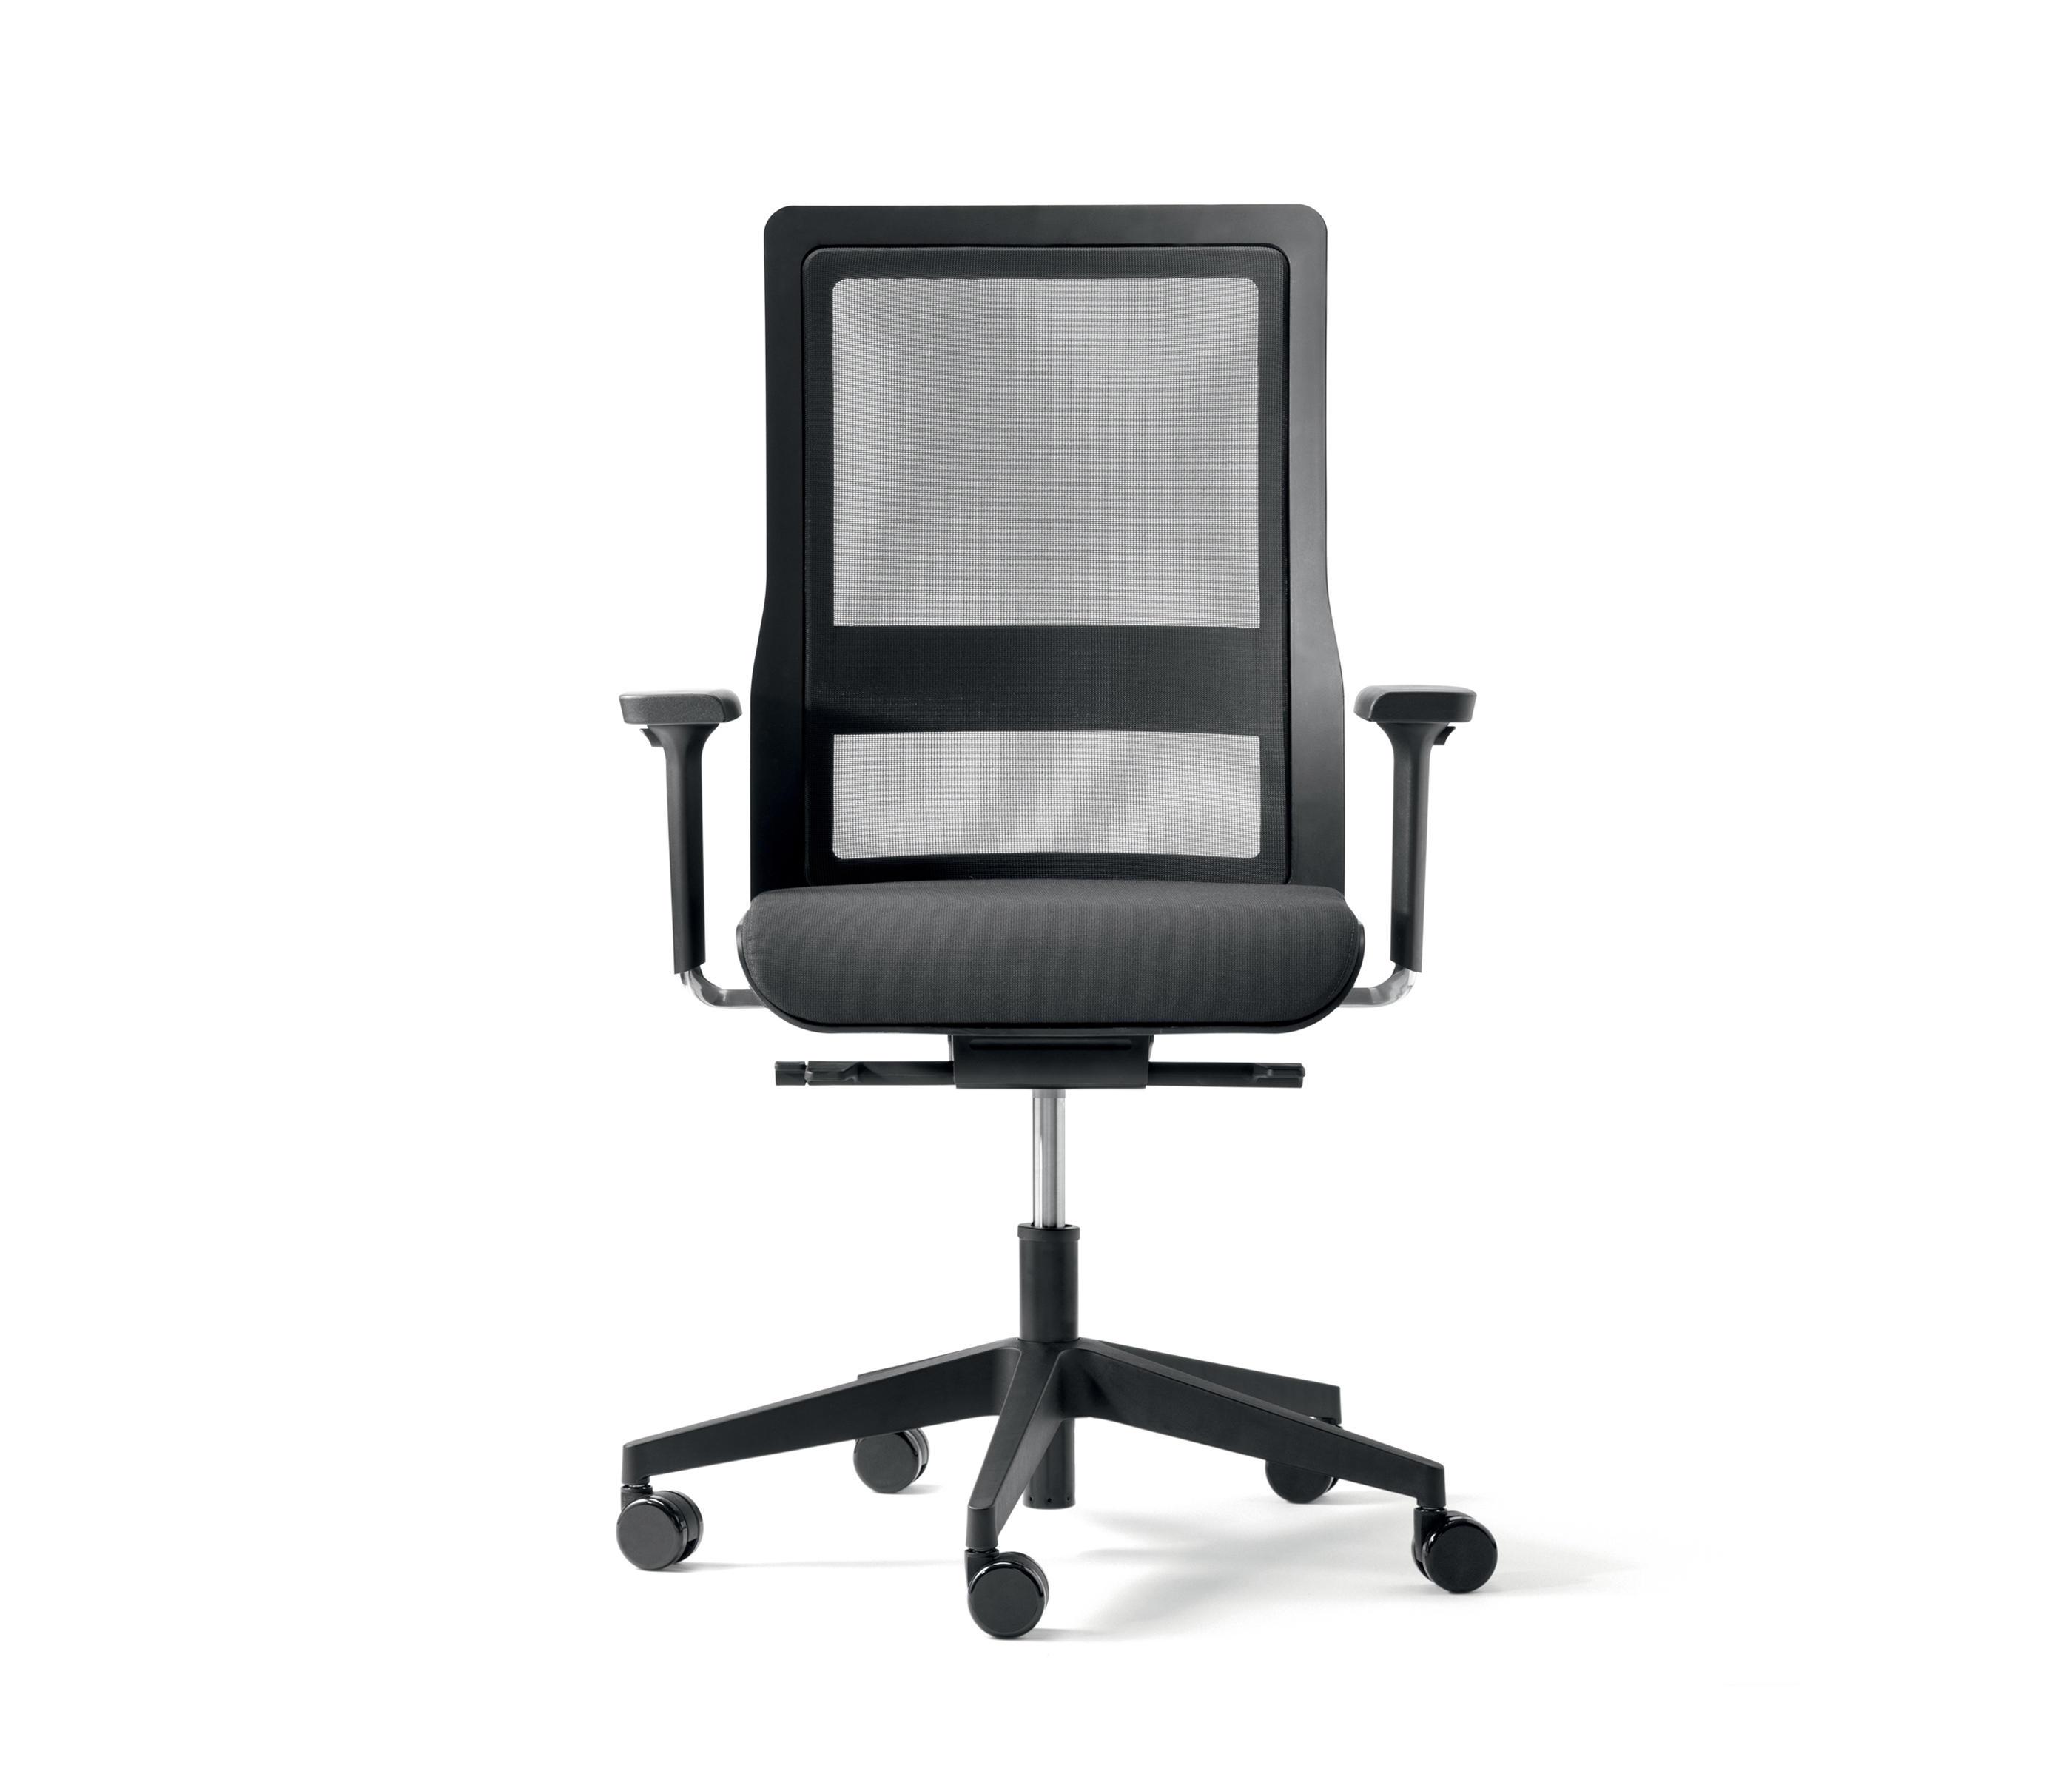 Poi Swivel Chair Designer Furniture Architonic